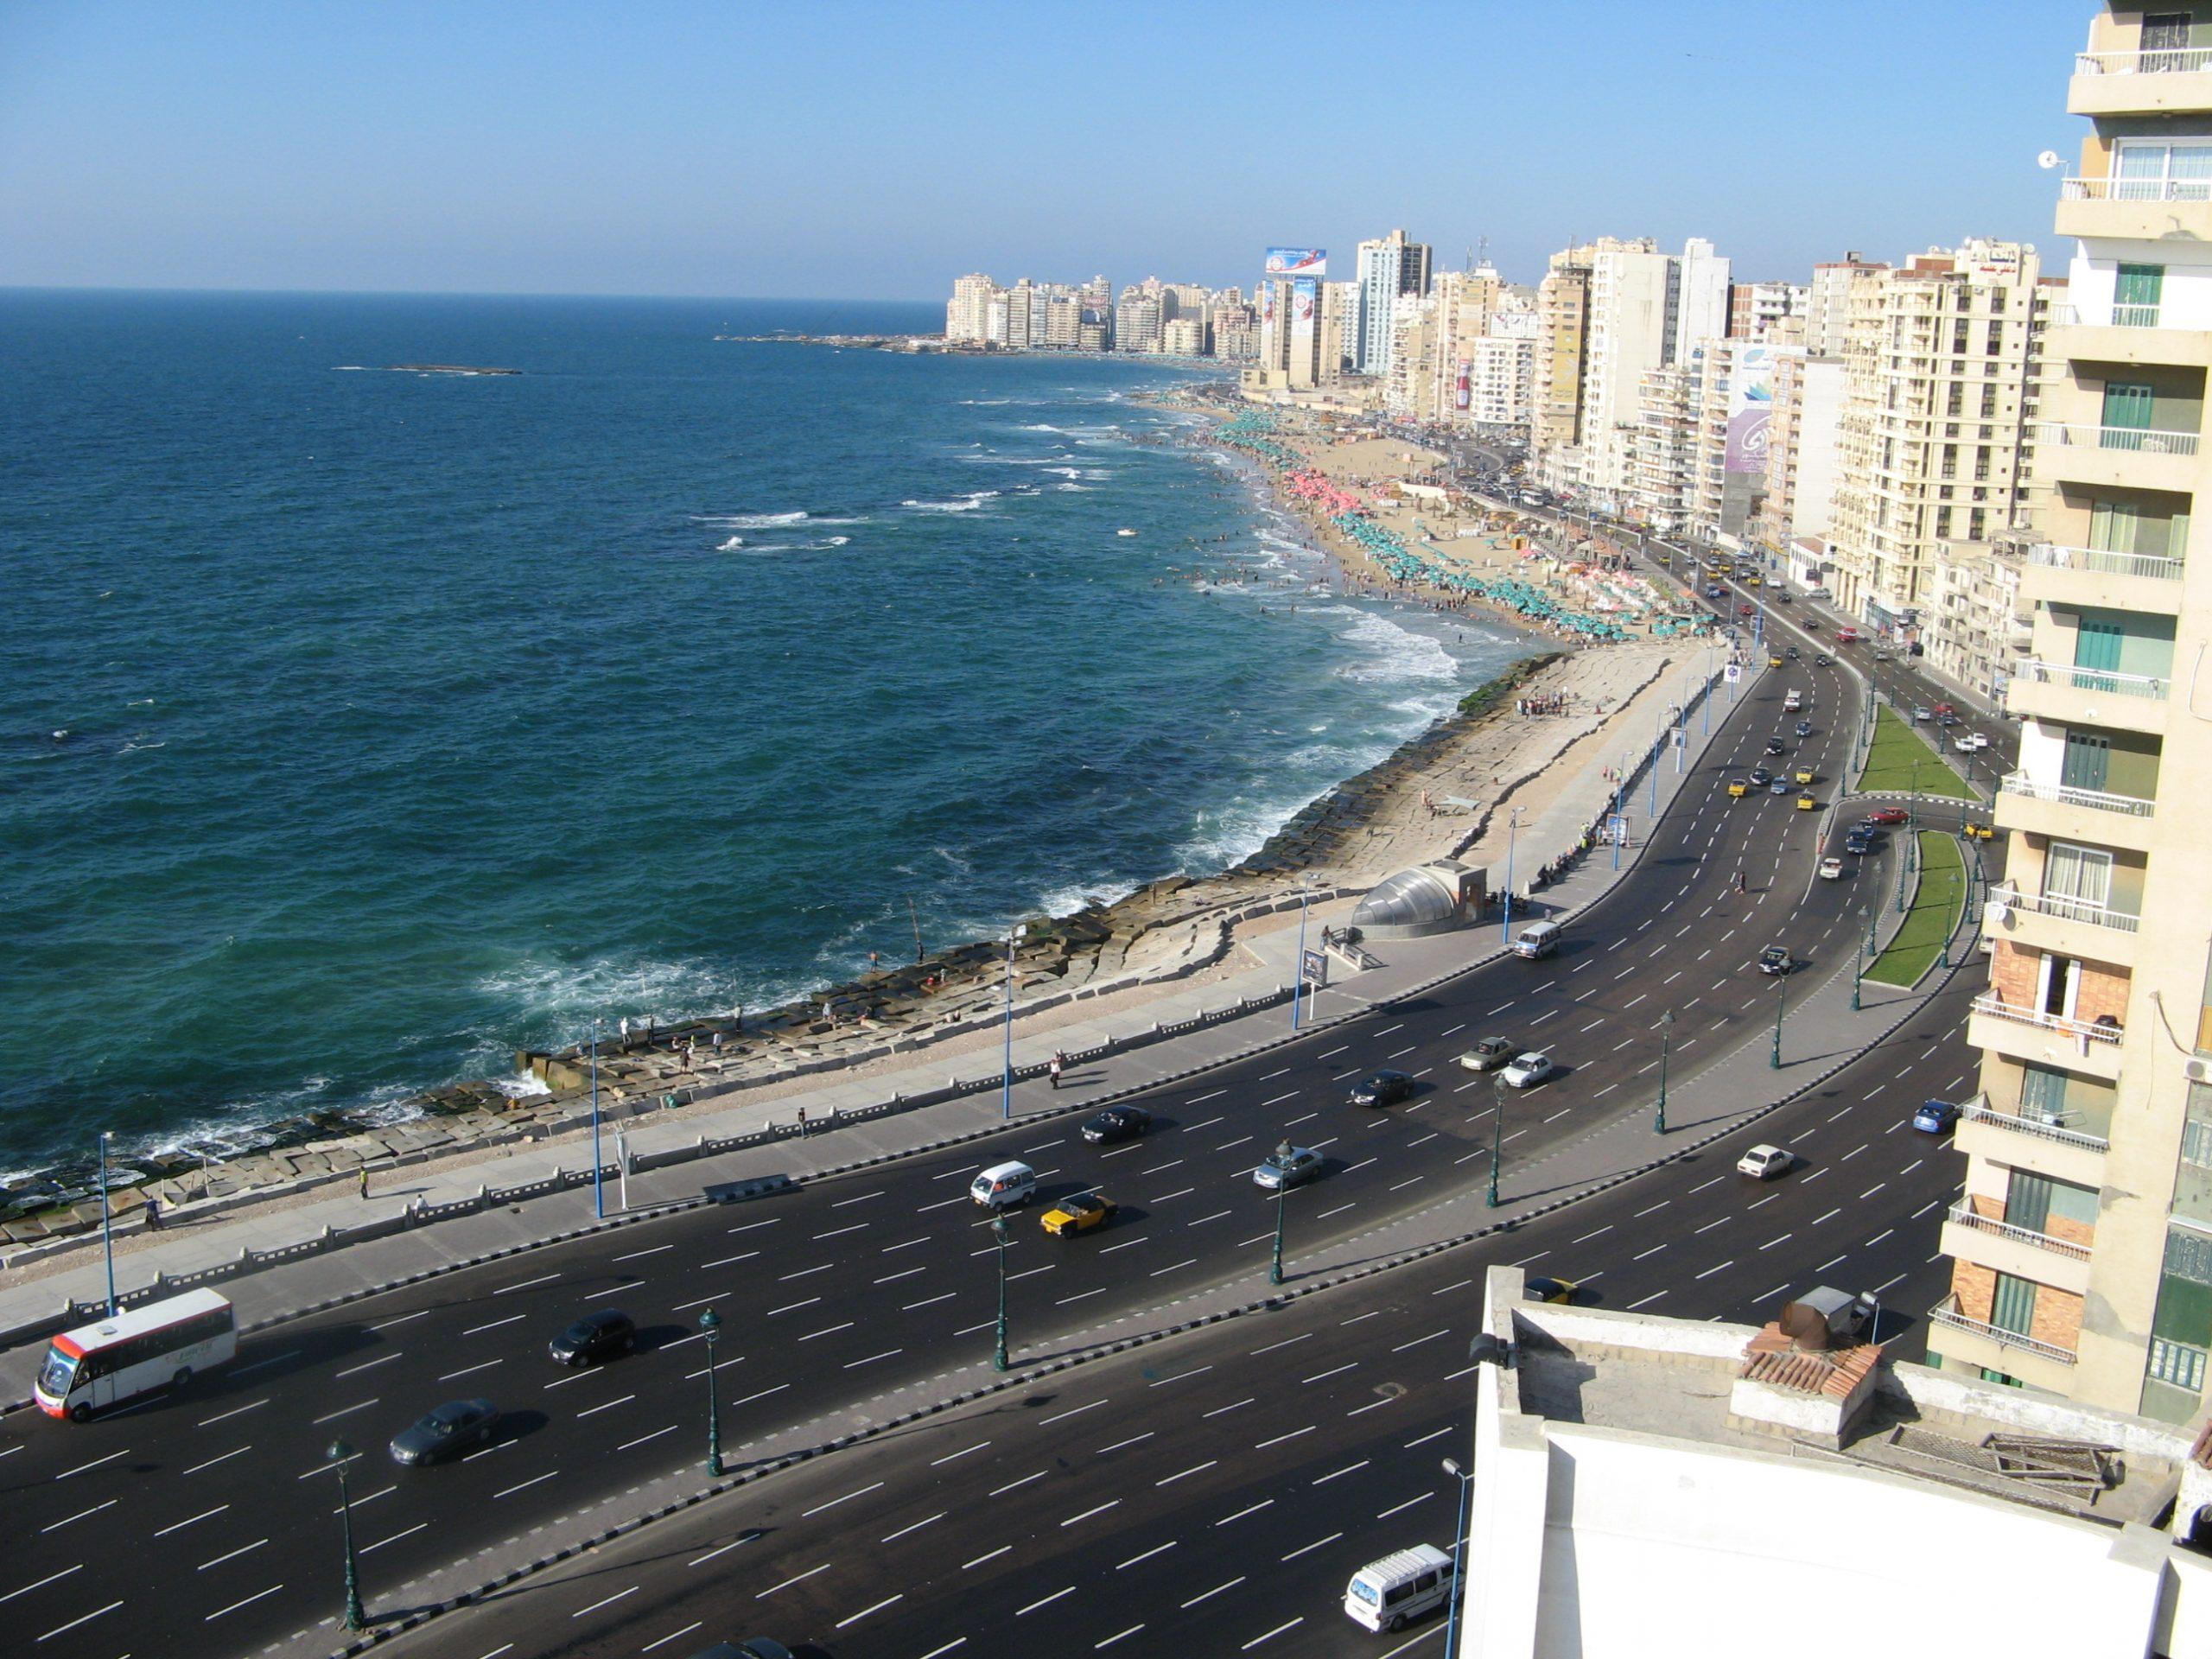 Alexandria_coast_(2715600220)